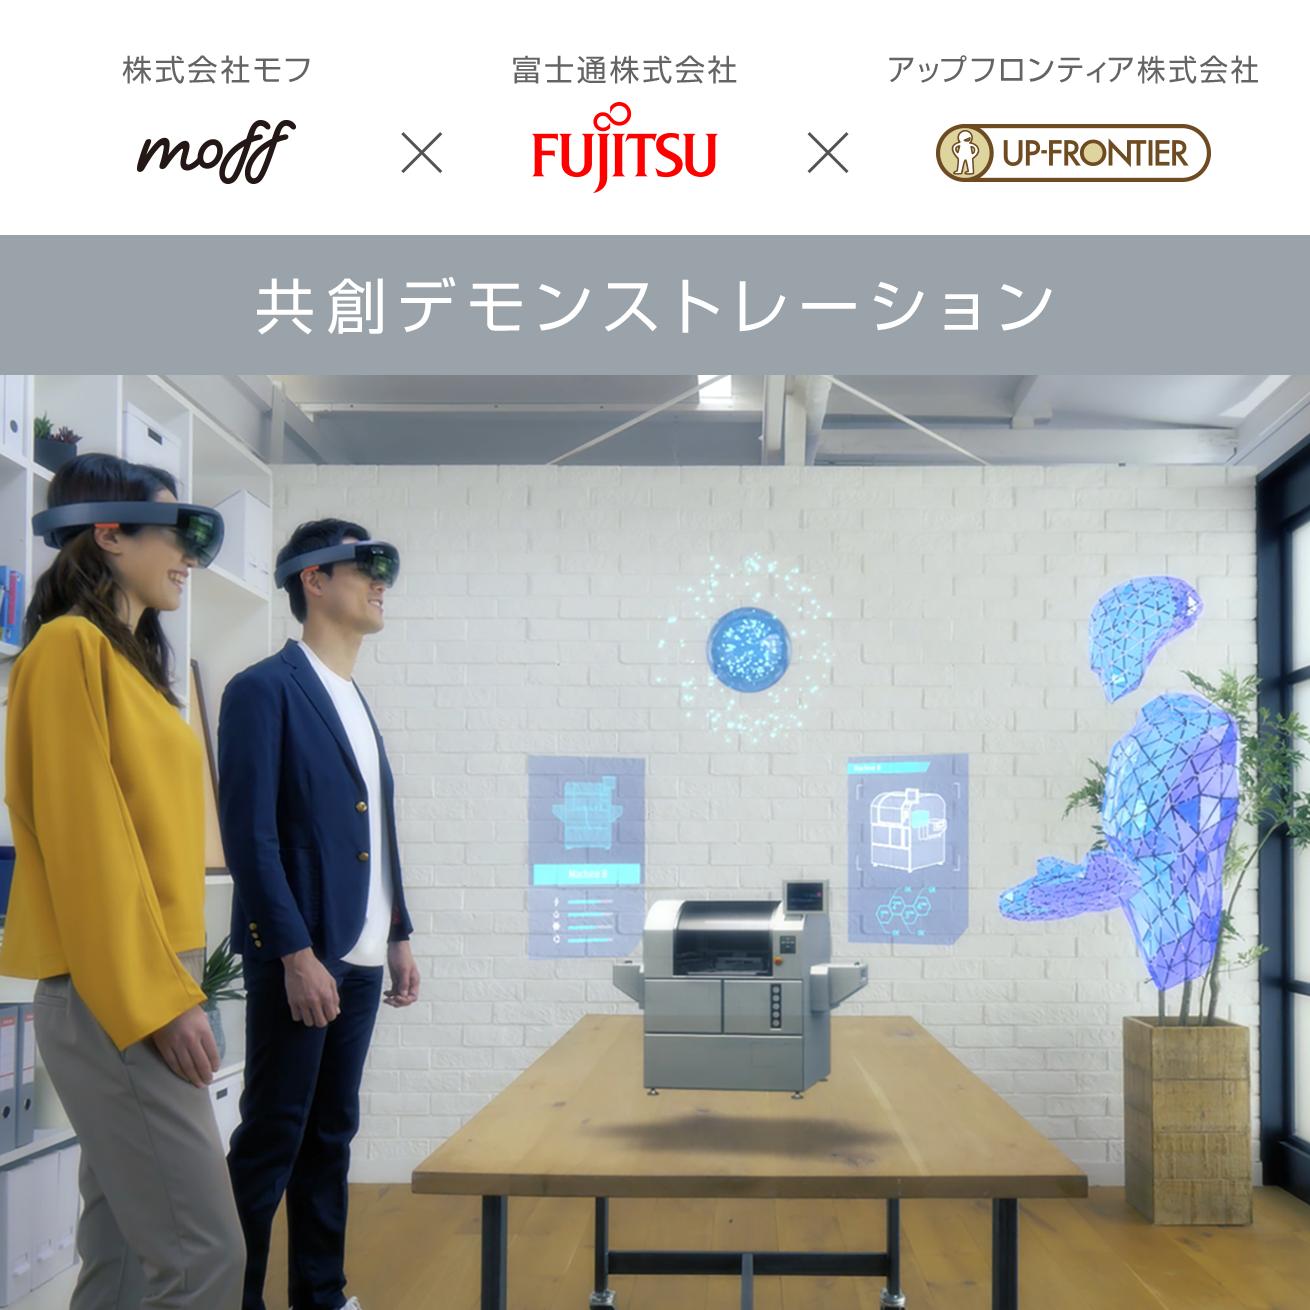 HoloLens用デモアプリ 富士通株式会社 × 株式会社モフ × アップフロンティア株式会社 共創デモンストレーション①